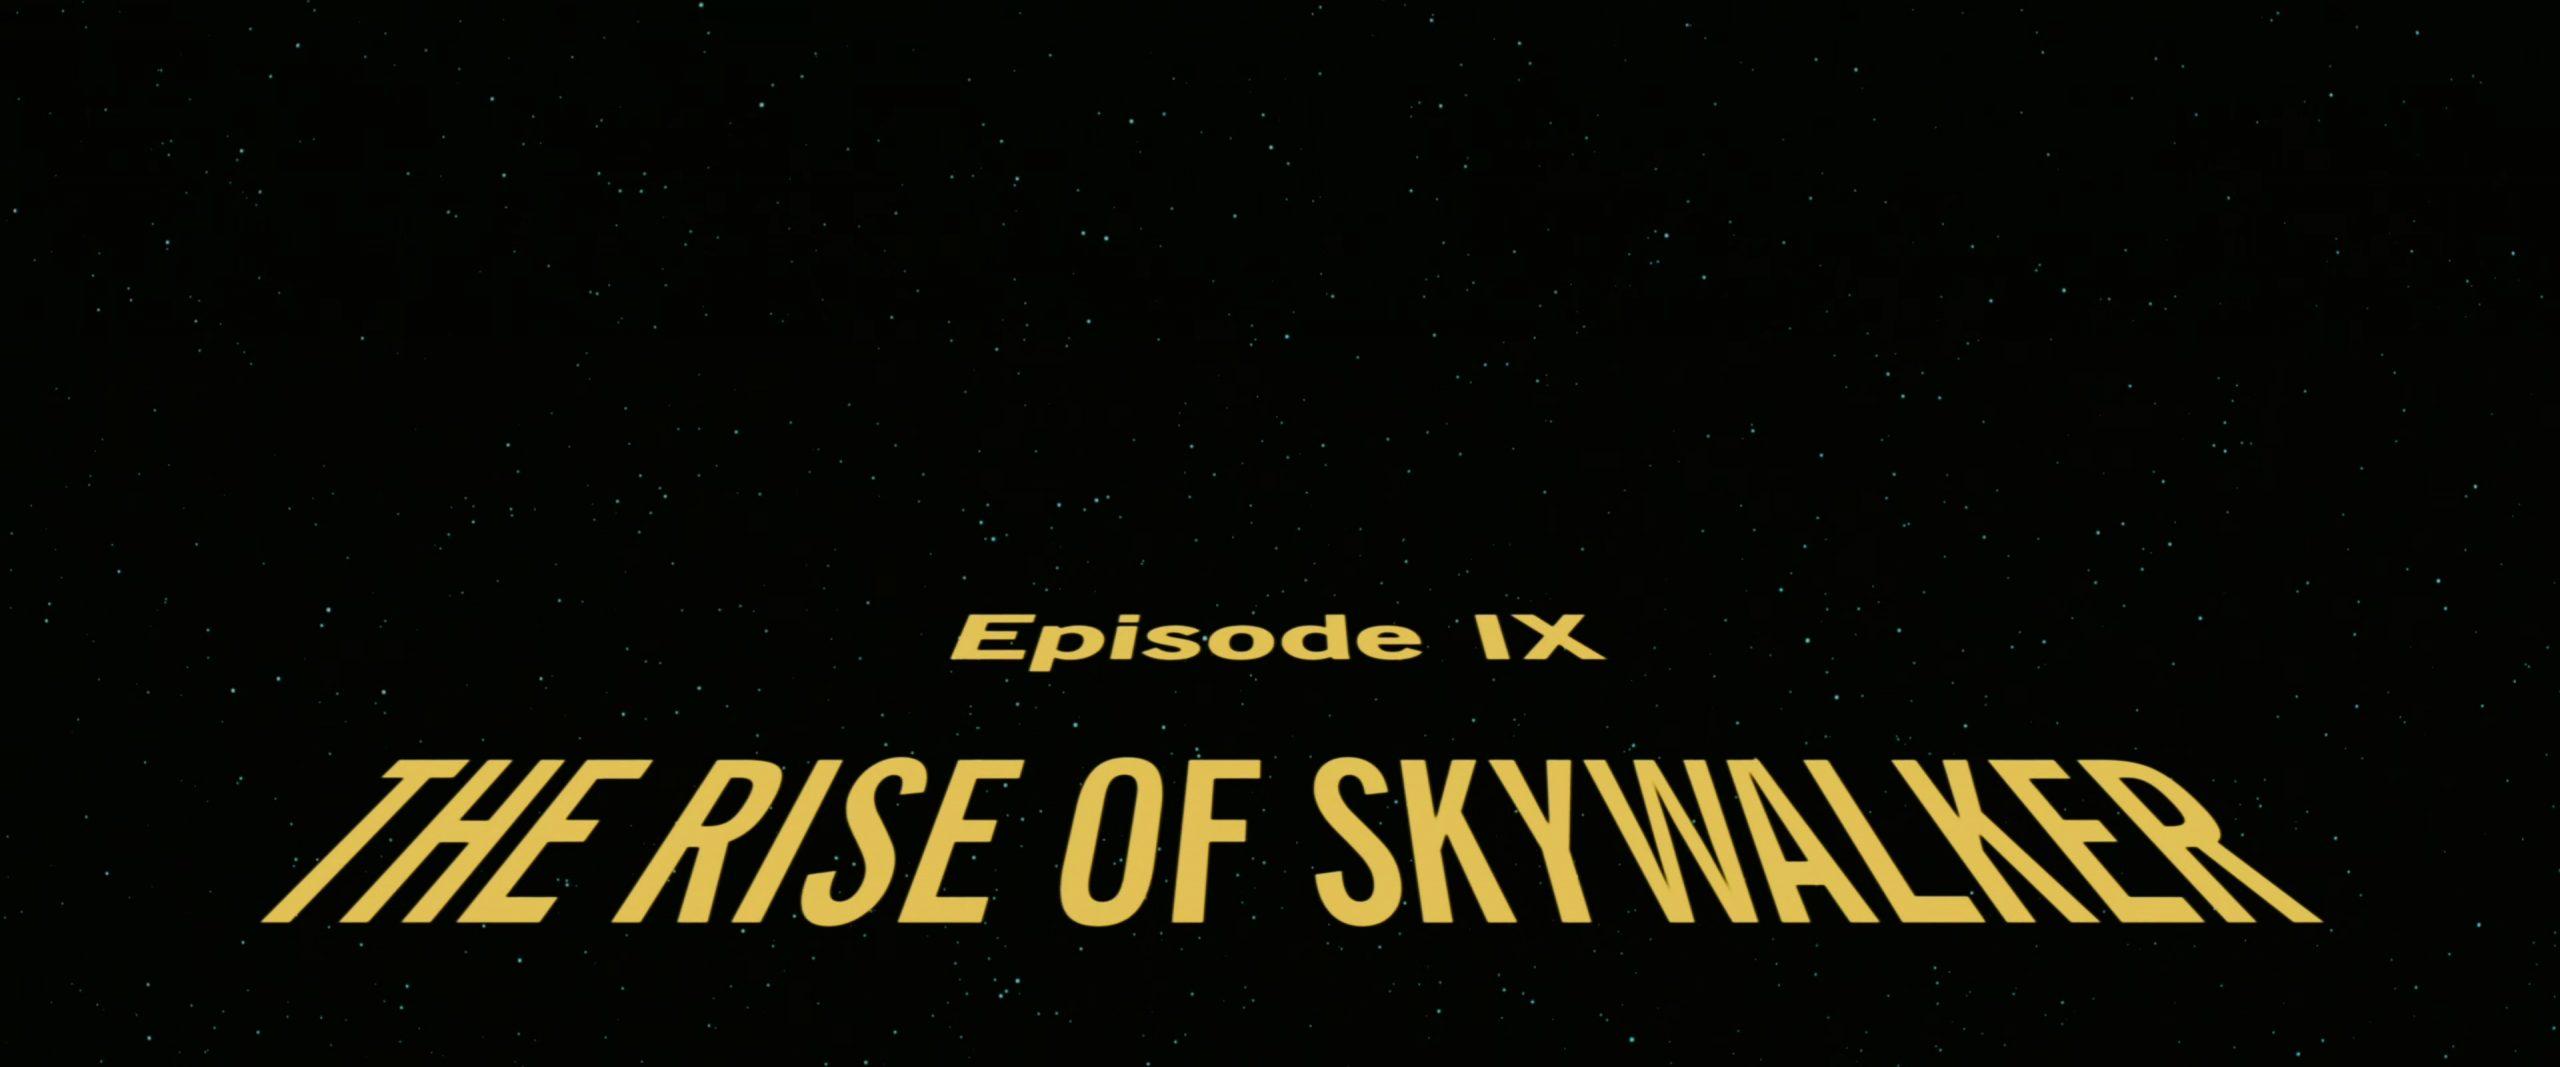 Star Wars: Episode IX – The Rise of Skywalker (2019) [4K]